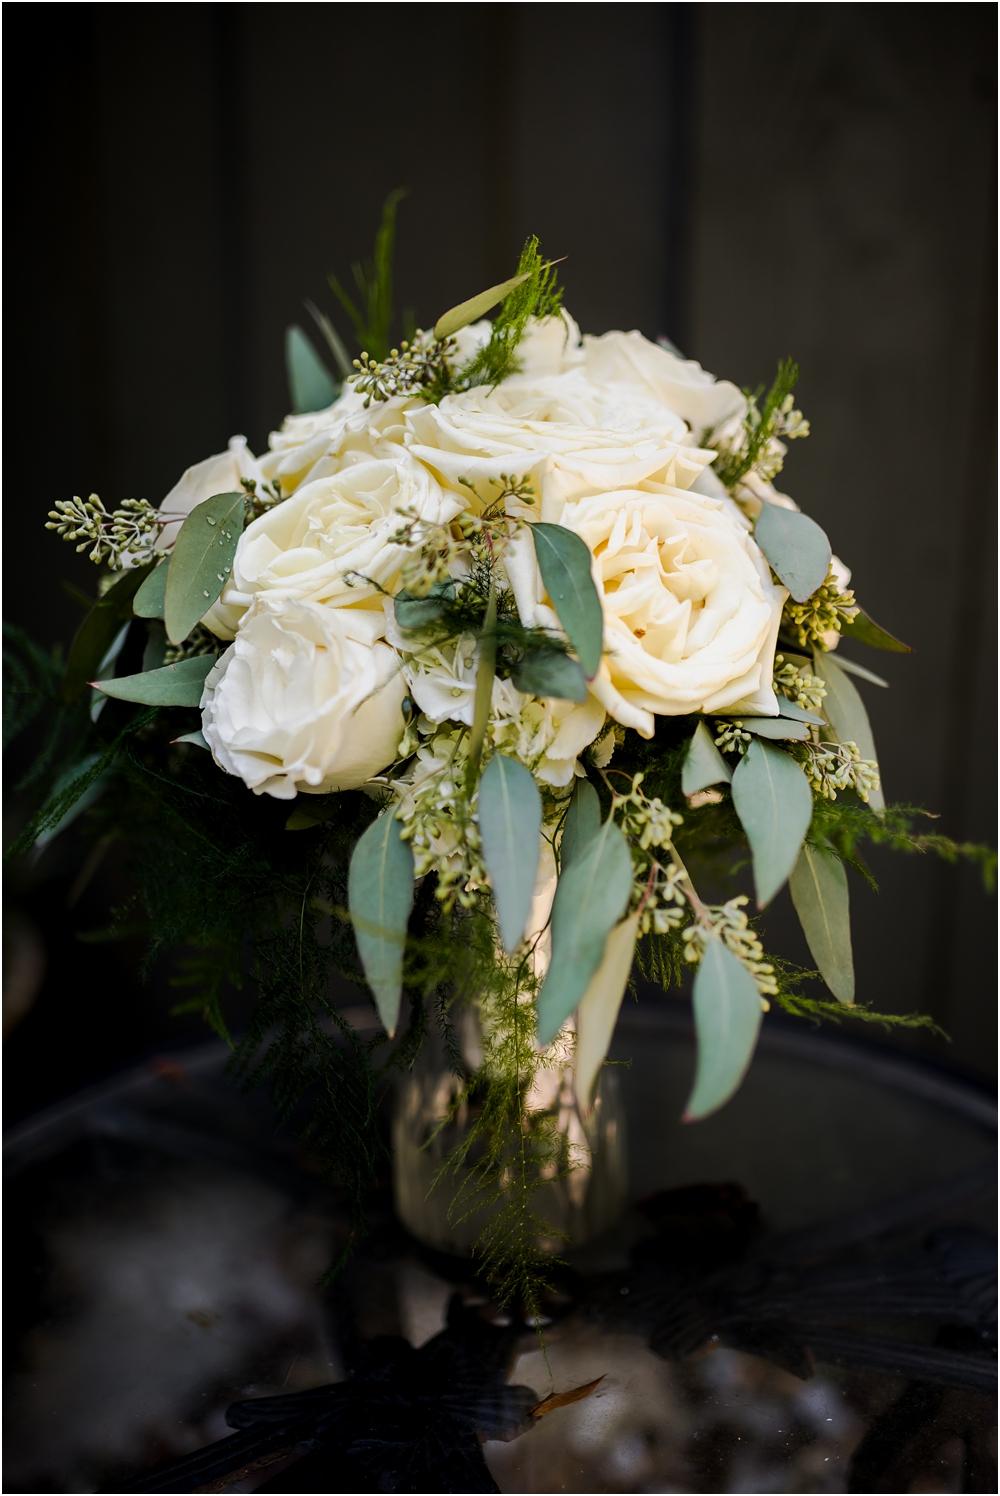 matthew-wedding-kiersten-stevenson-photography-30a-panama-city-beach-dothan-tallahassee-(21-of-579).JPG